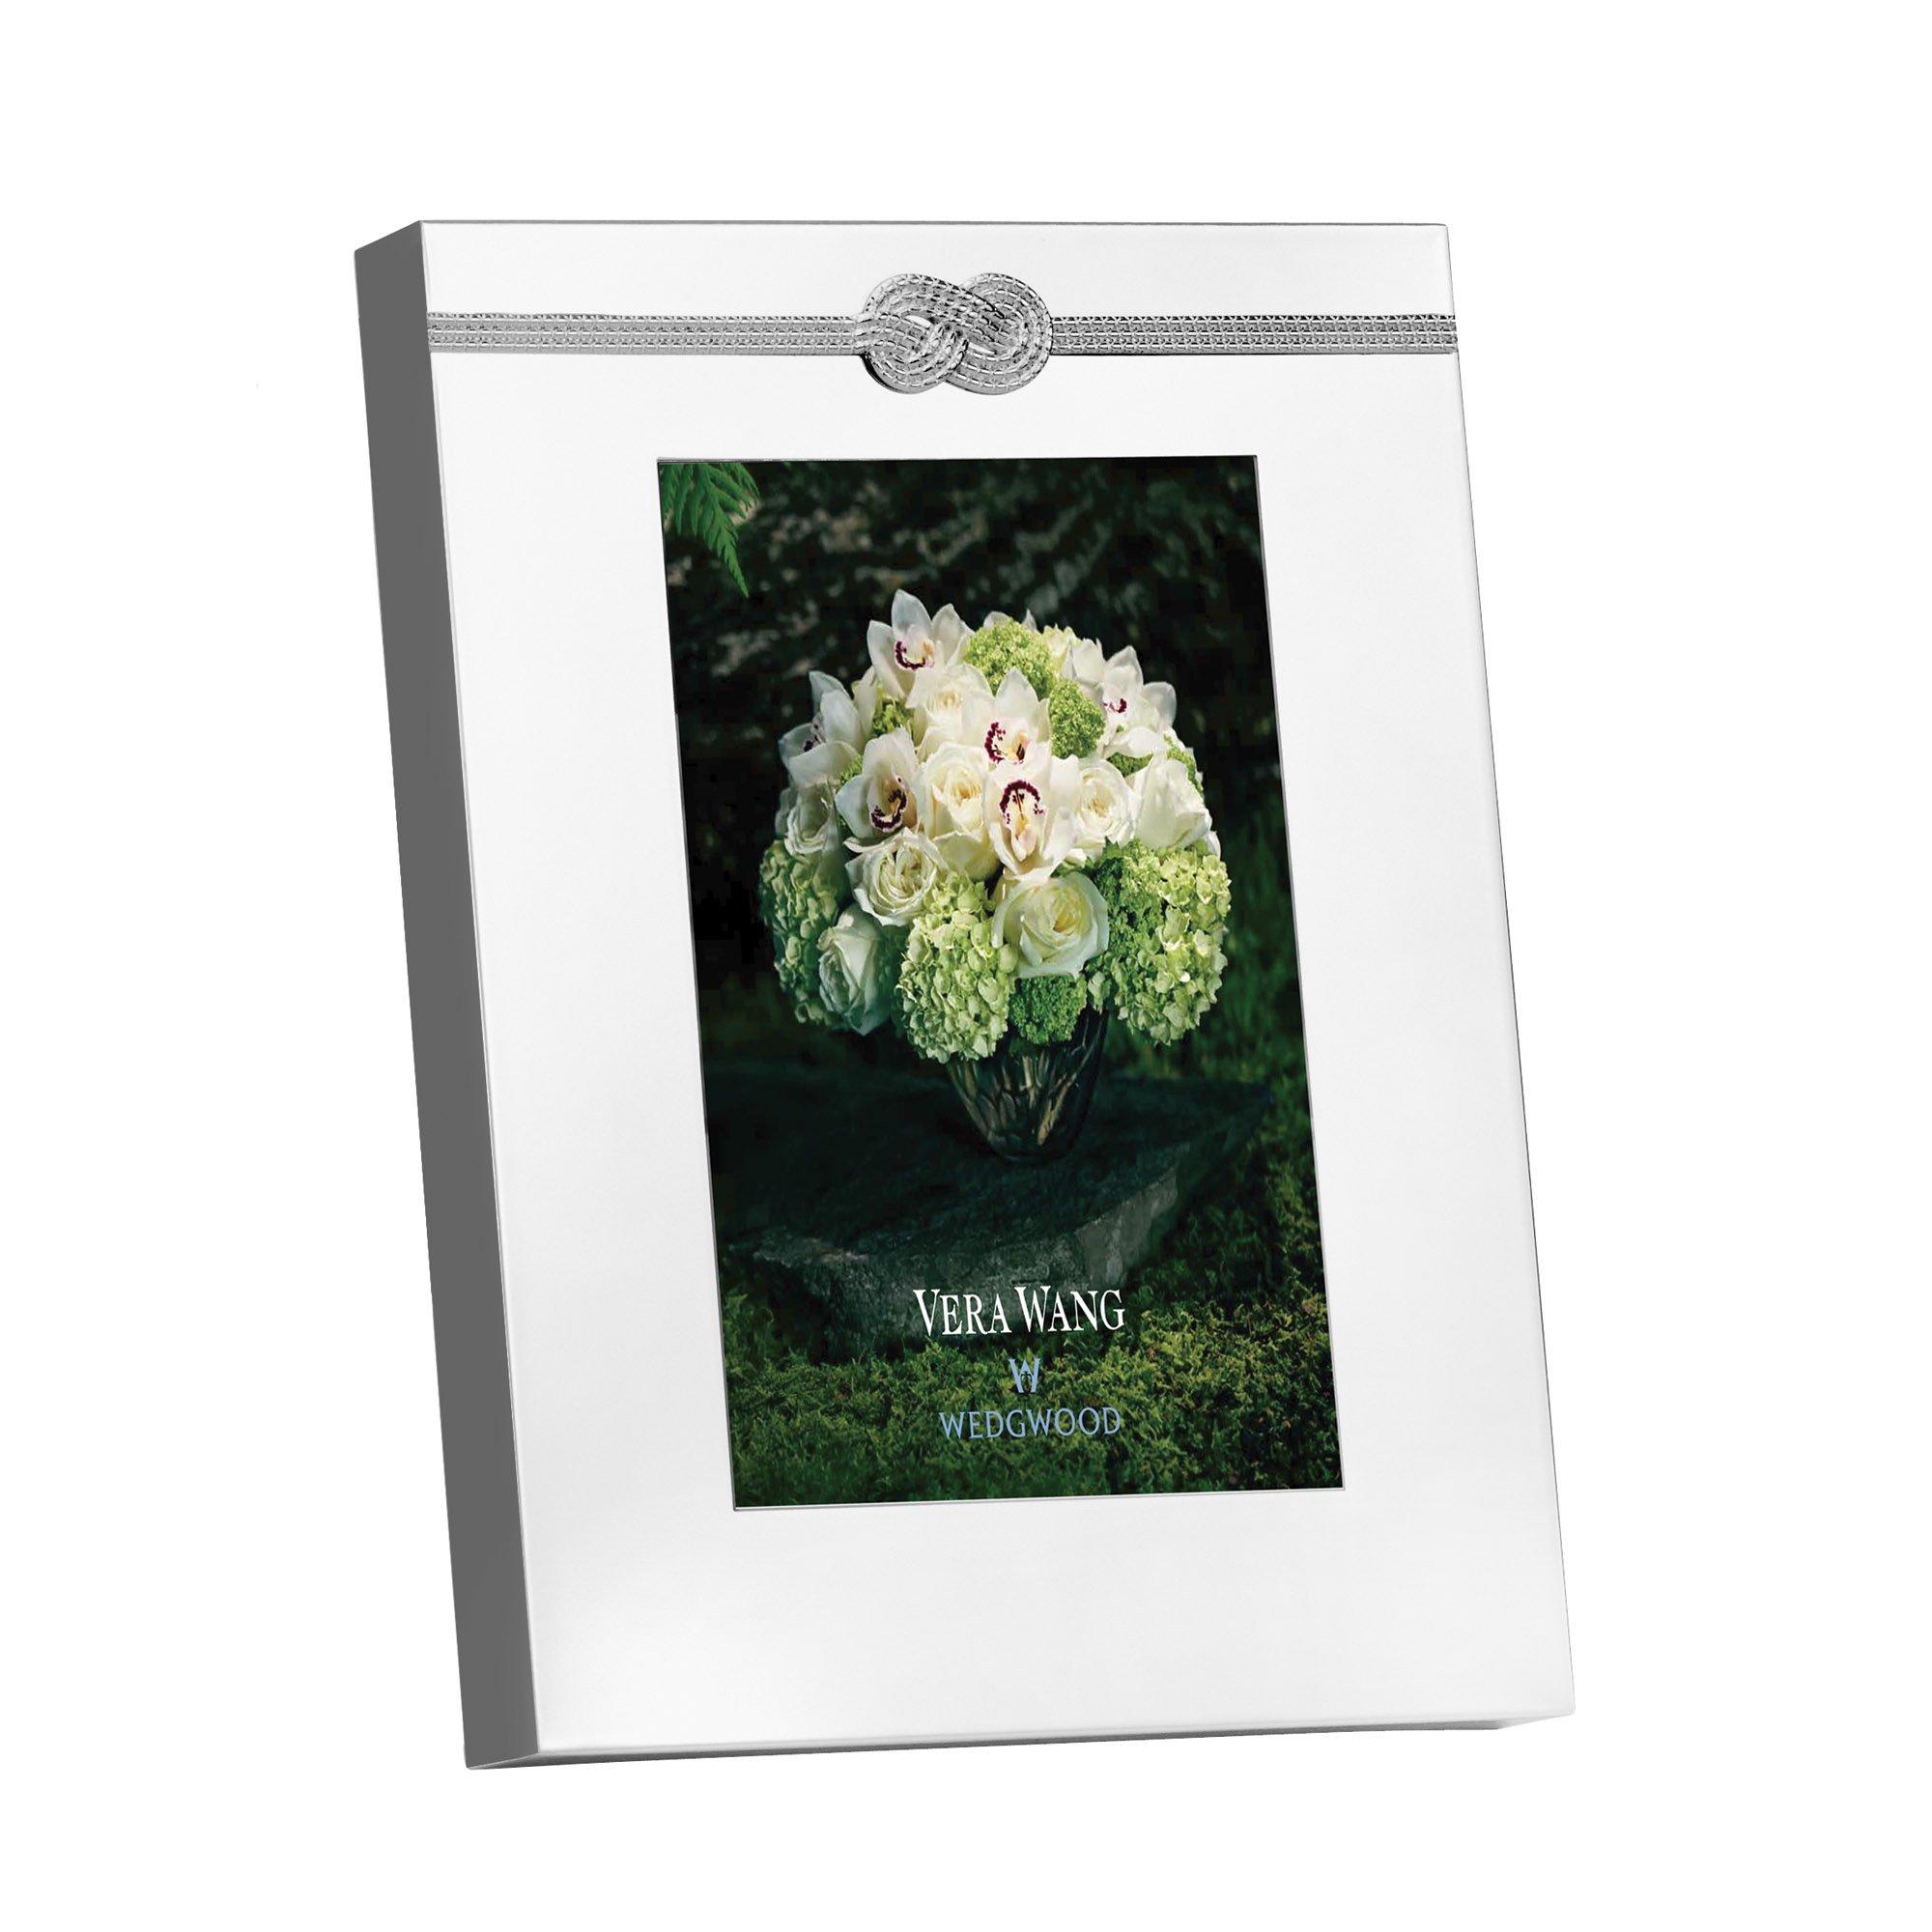 "Vera Wang Infinity Frame 4""x6"" (10cm x 15cm)"